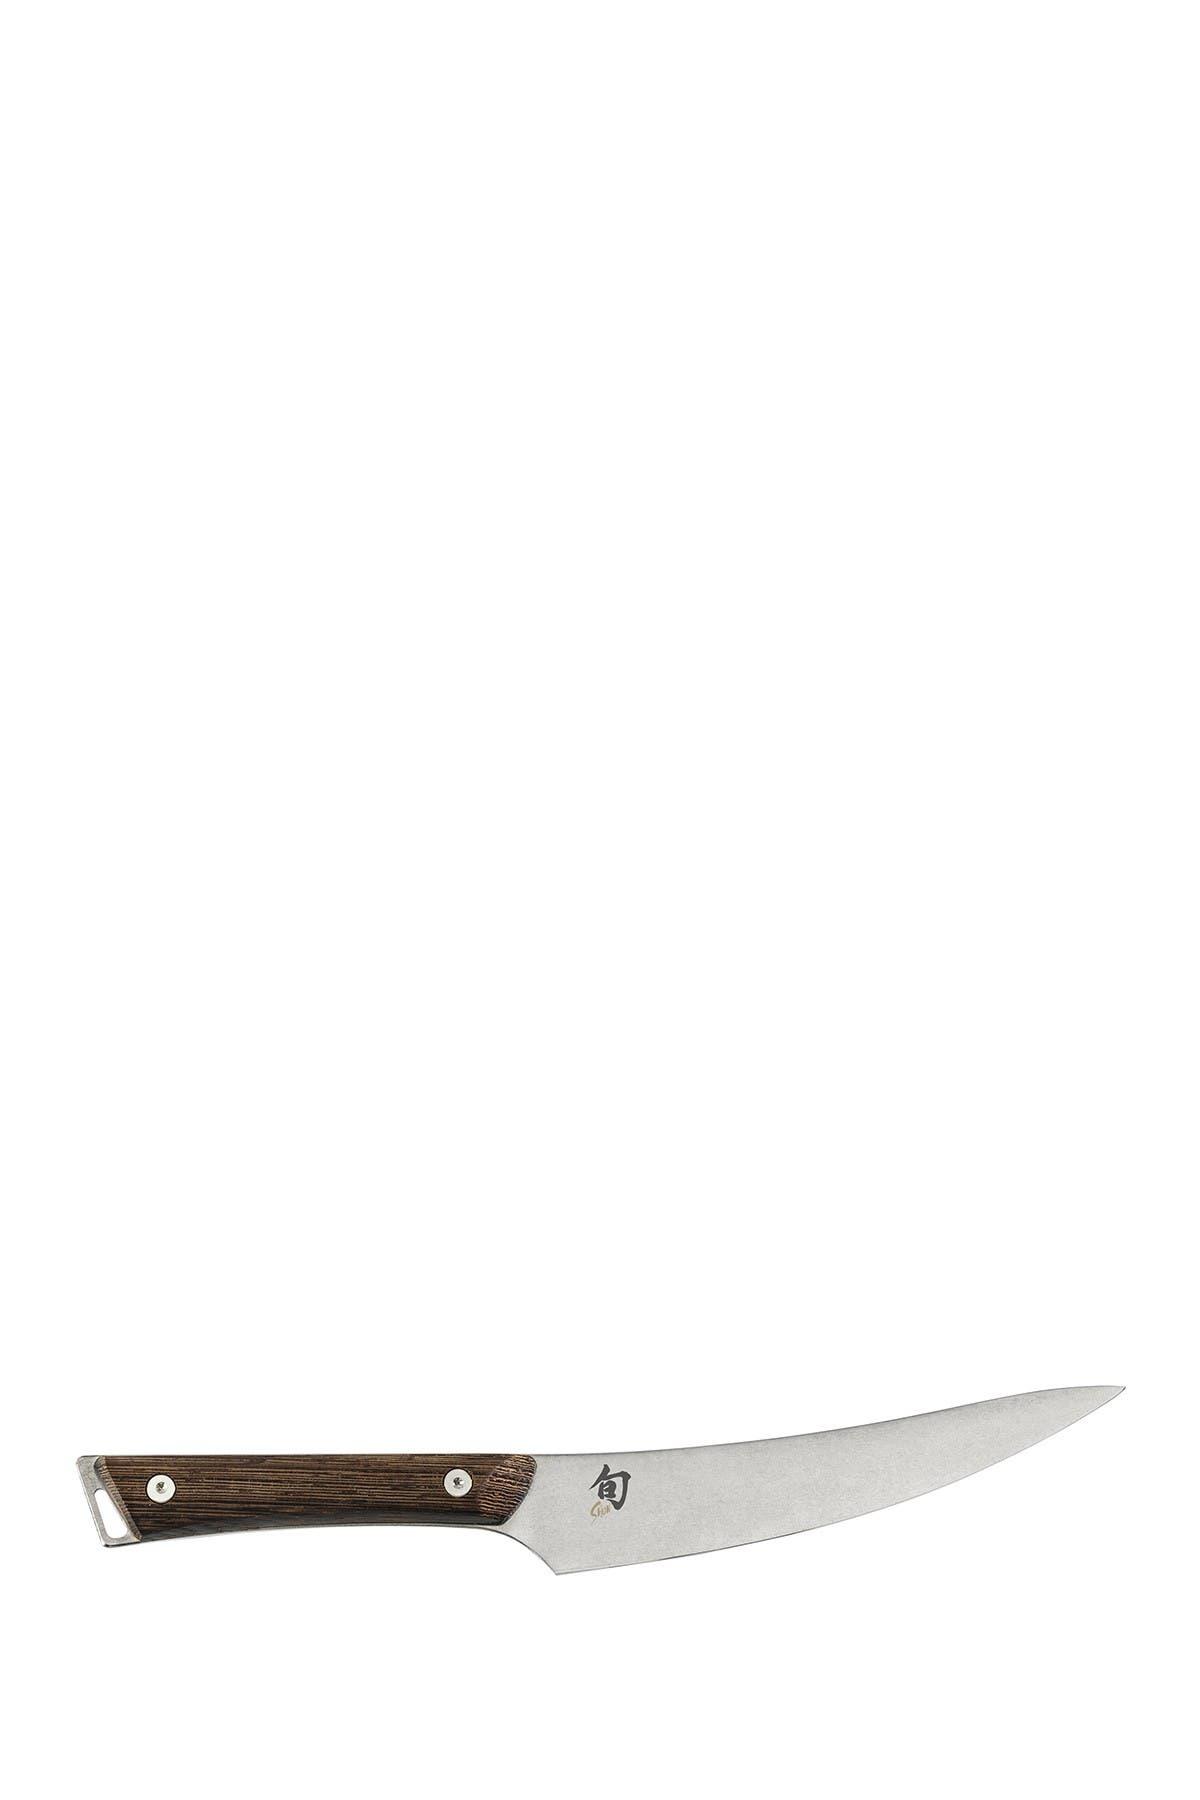 "Image of Shun Cutlery Kanso 6.5"" Boning/Fillet Gokujo Knife"